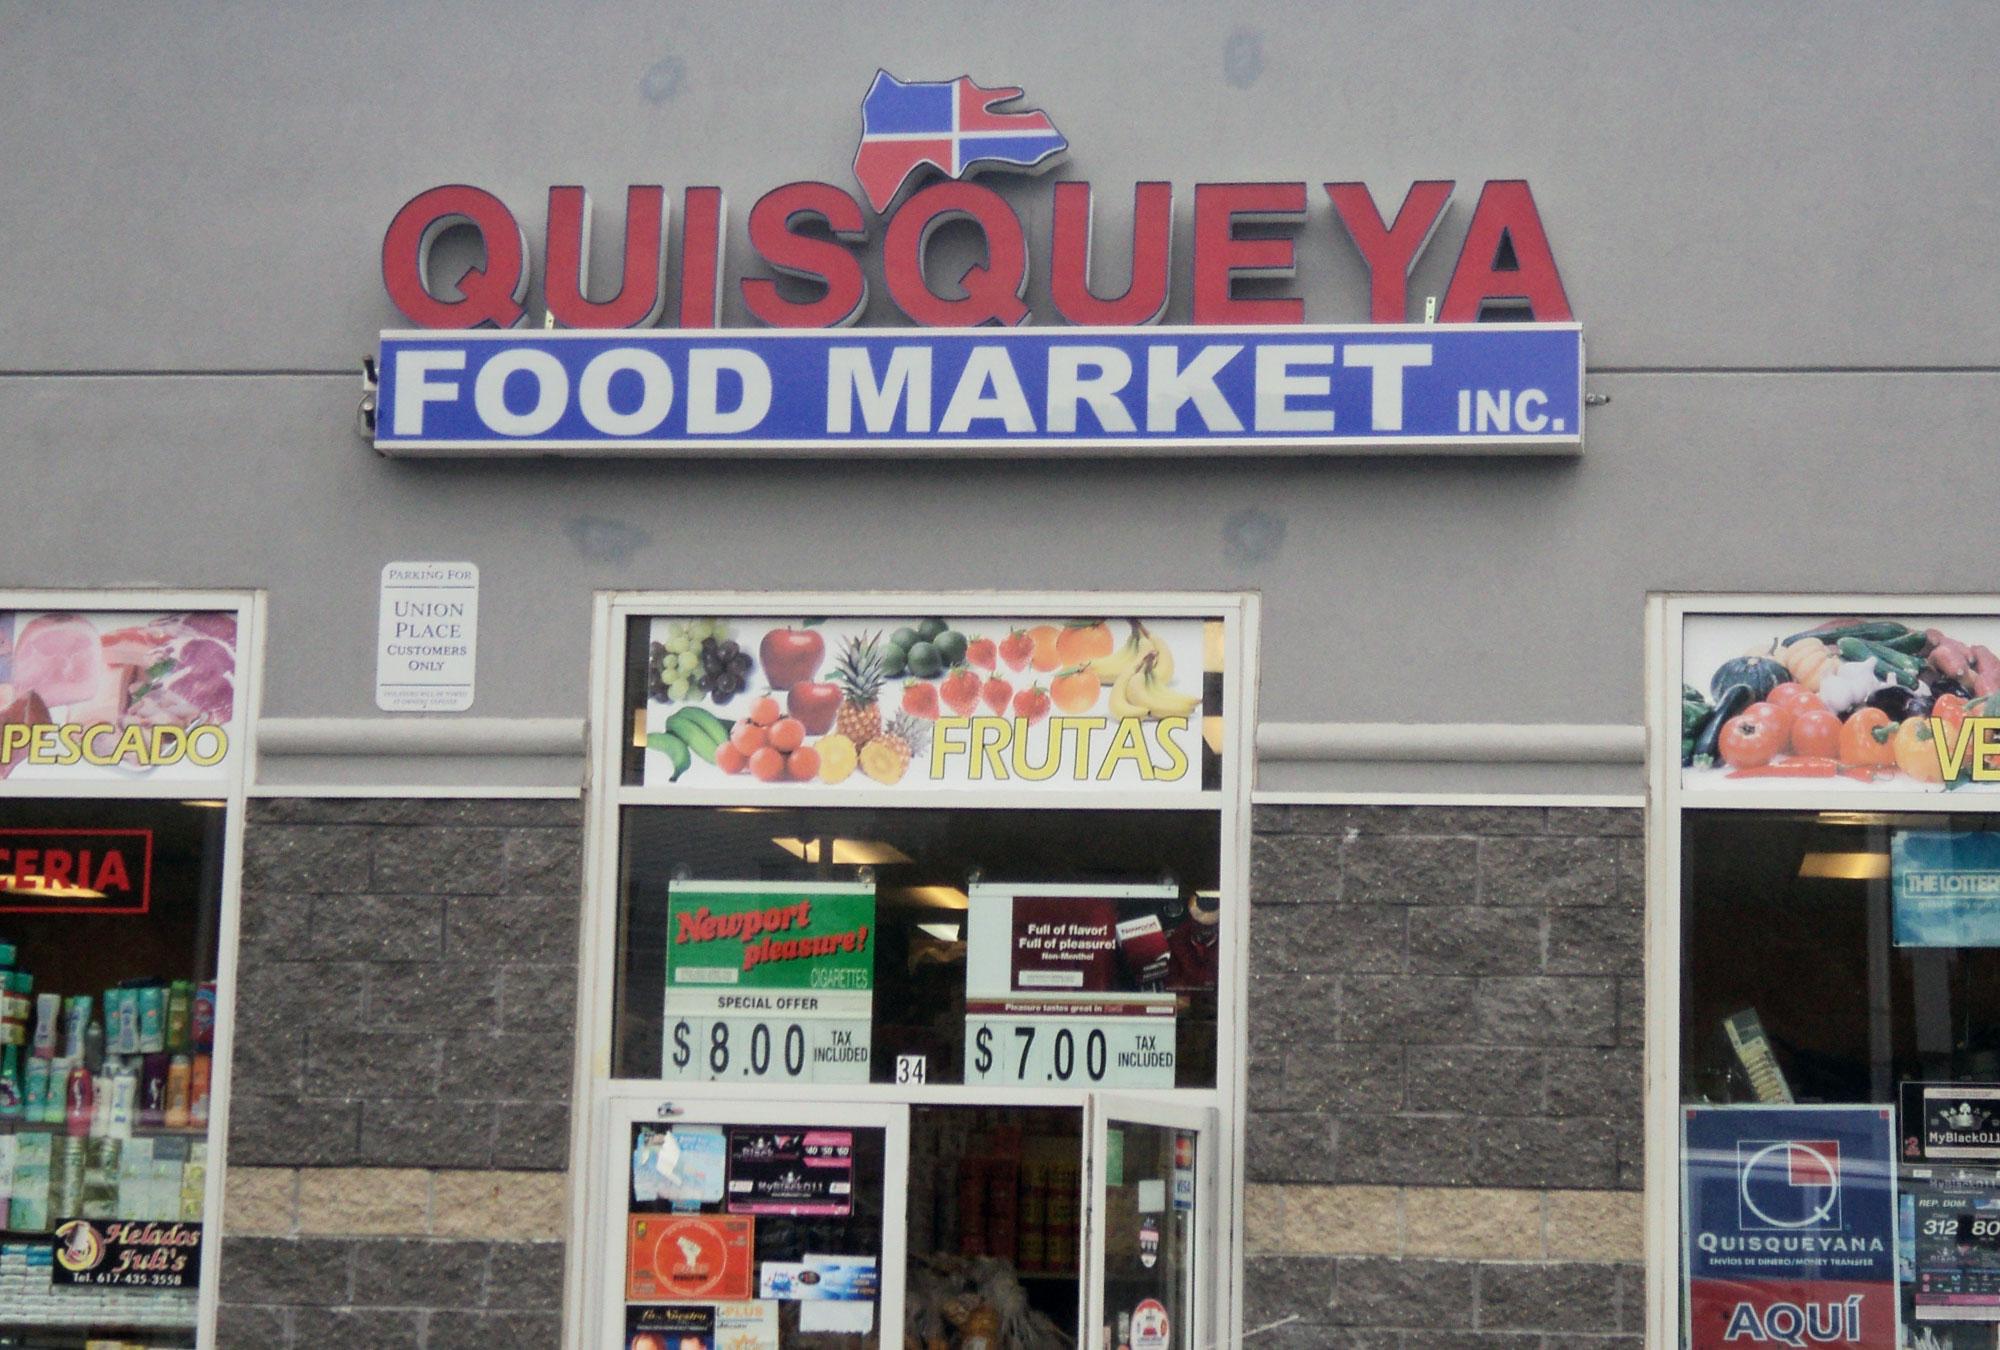 Entrance to Quisqueya Food Market